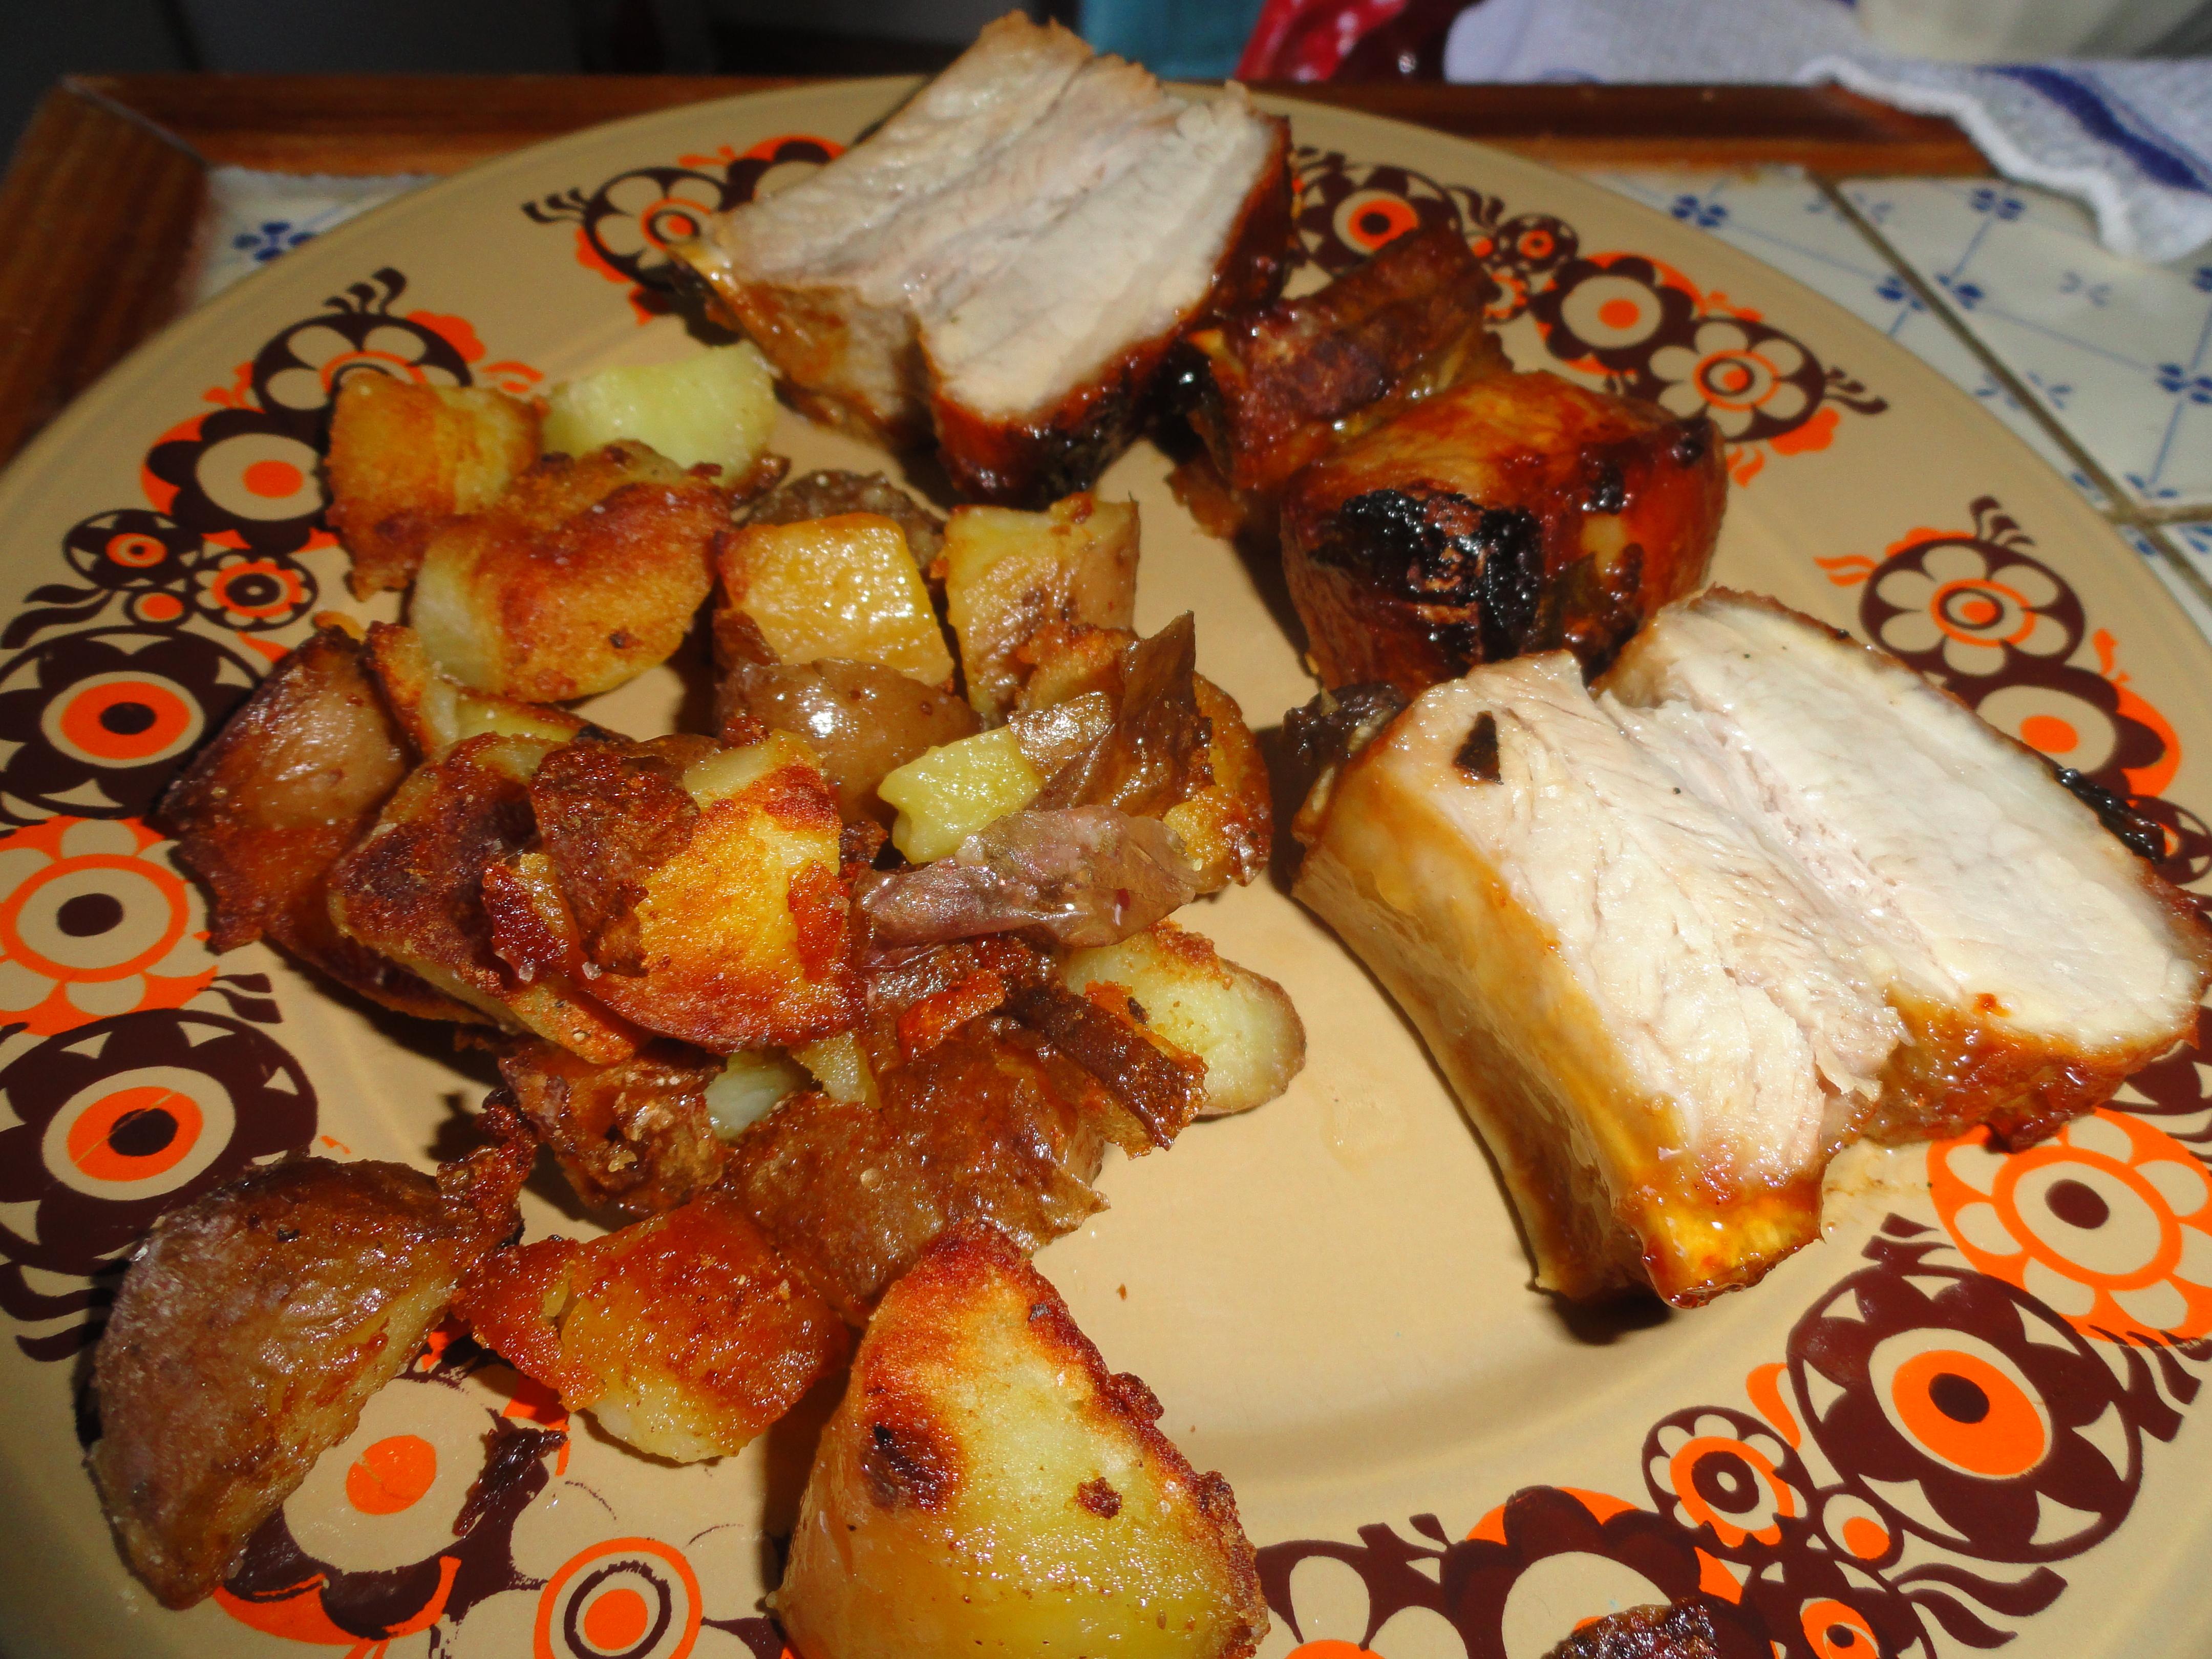 Travers De Porc Caram 233 Lis 233 S Barbecue Ribs Geri Tara